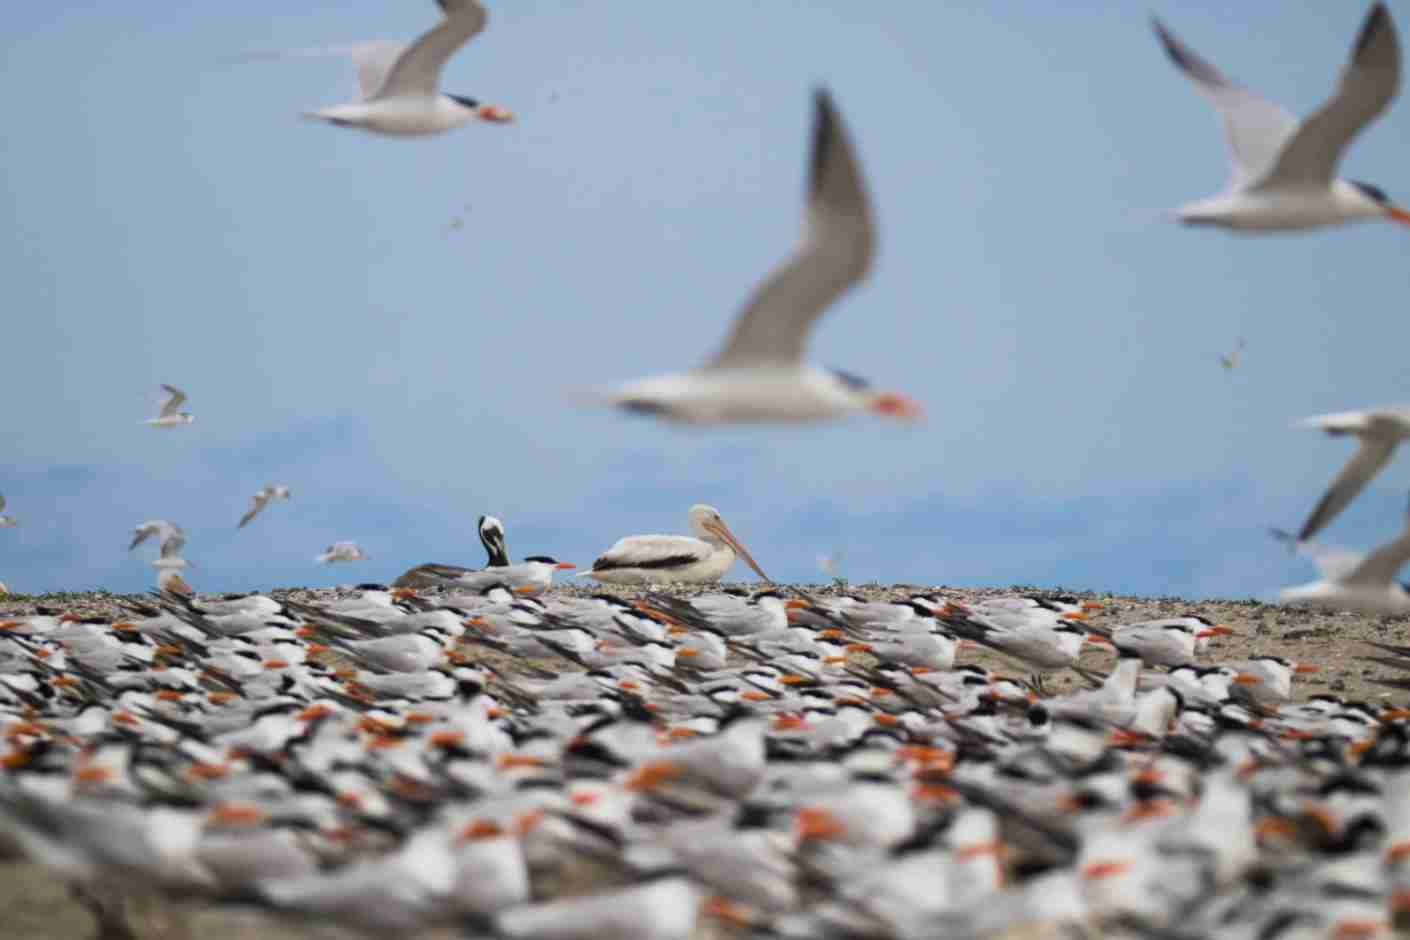 Great blue herons, among other birds, inhabit Hilton Head Island. (Photo by Forest Simon/Unsplash)